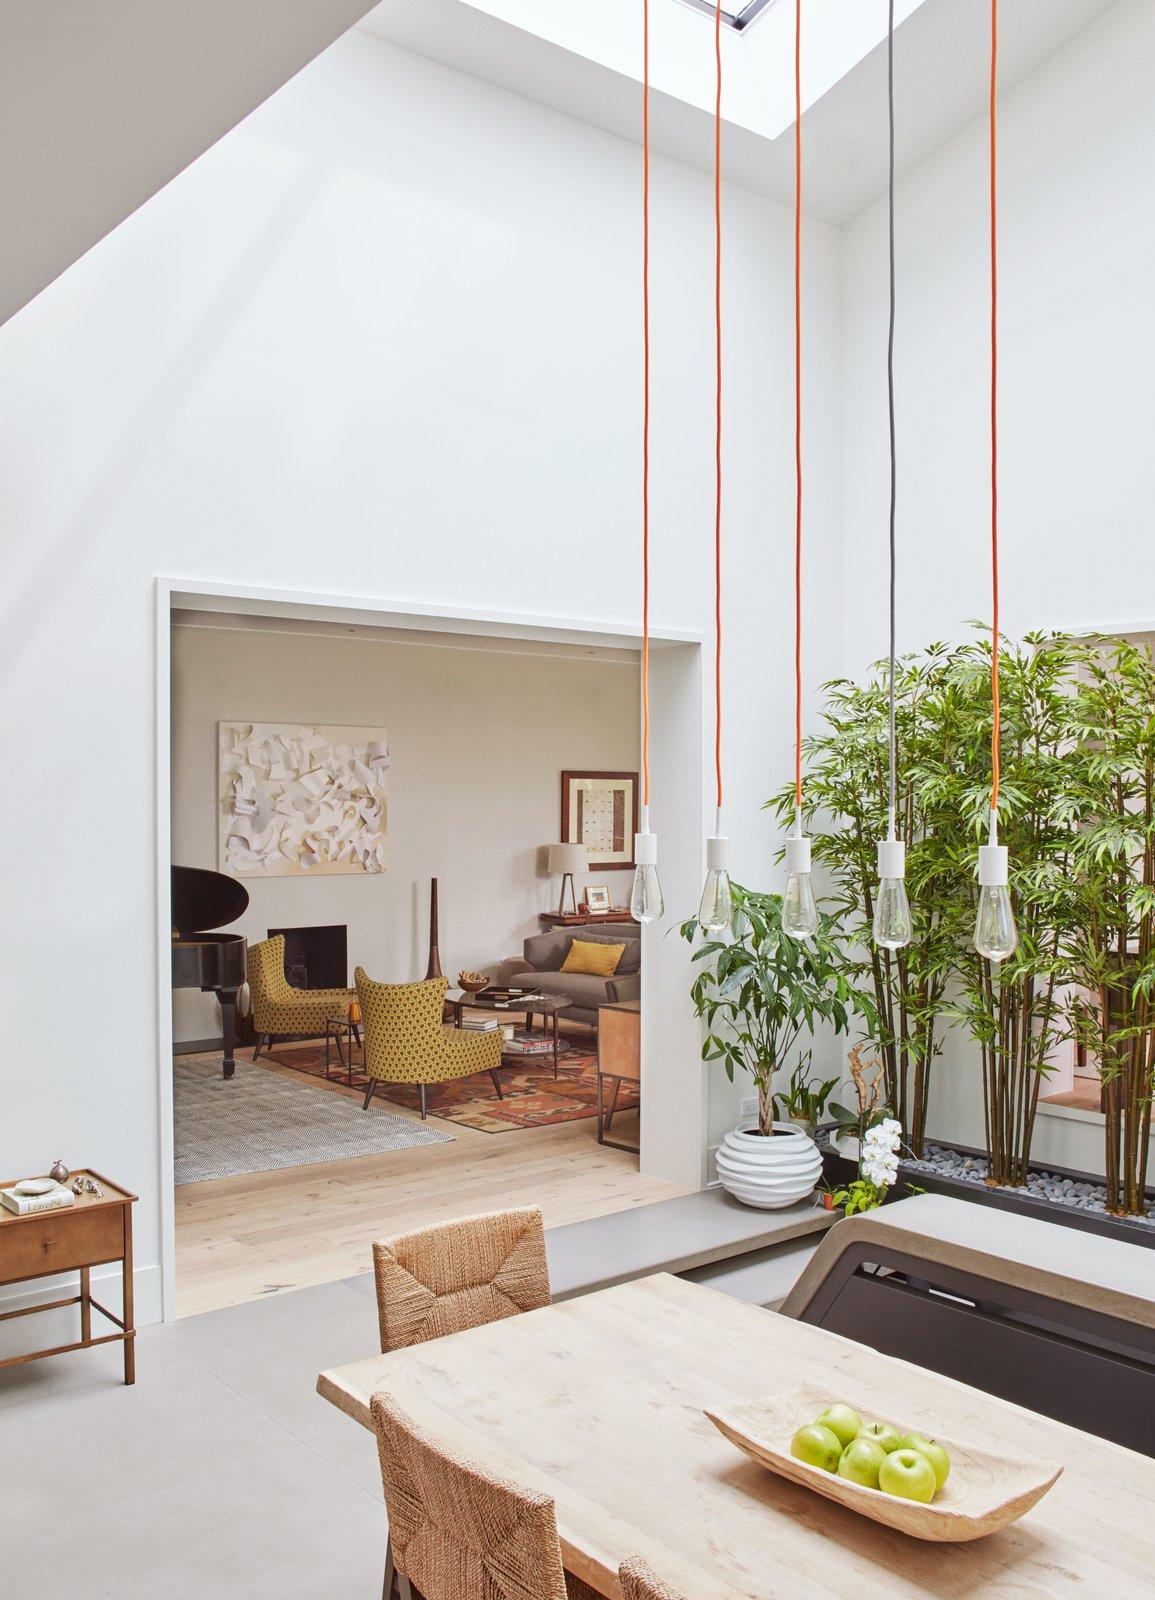 #lighting #livingroom #diningroom #soco #pendantlights  #techlighting #pendant  60+ Modern Lighting Solutions by Dwell from Lighting